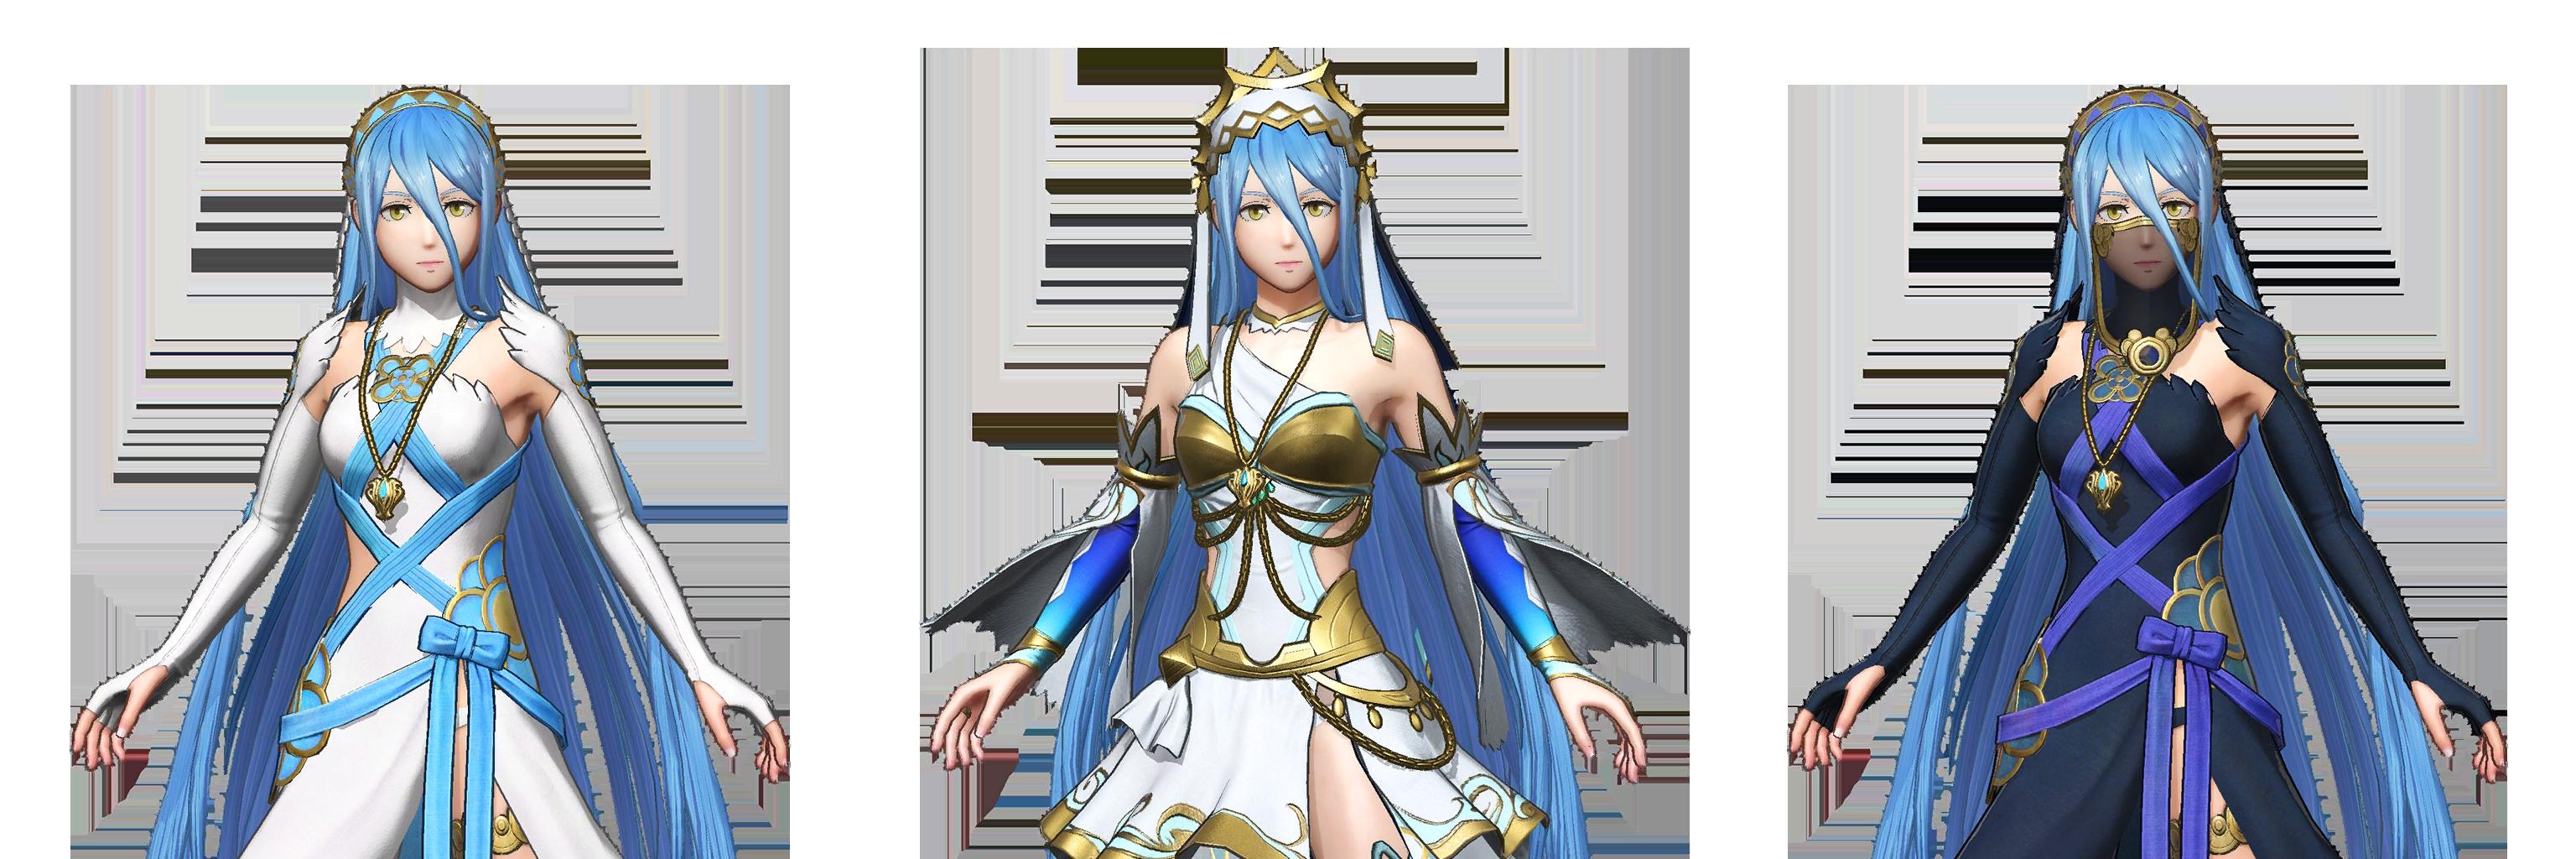 Nintendo Switch Fire Emblem Warriors Azura The Spriters Resource